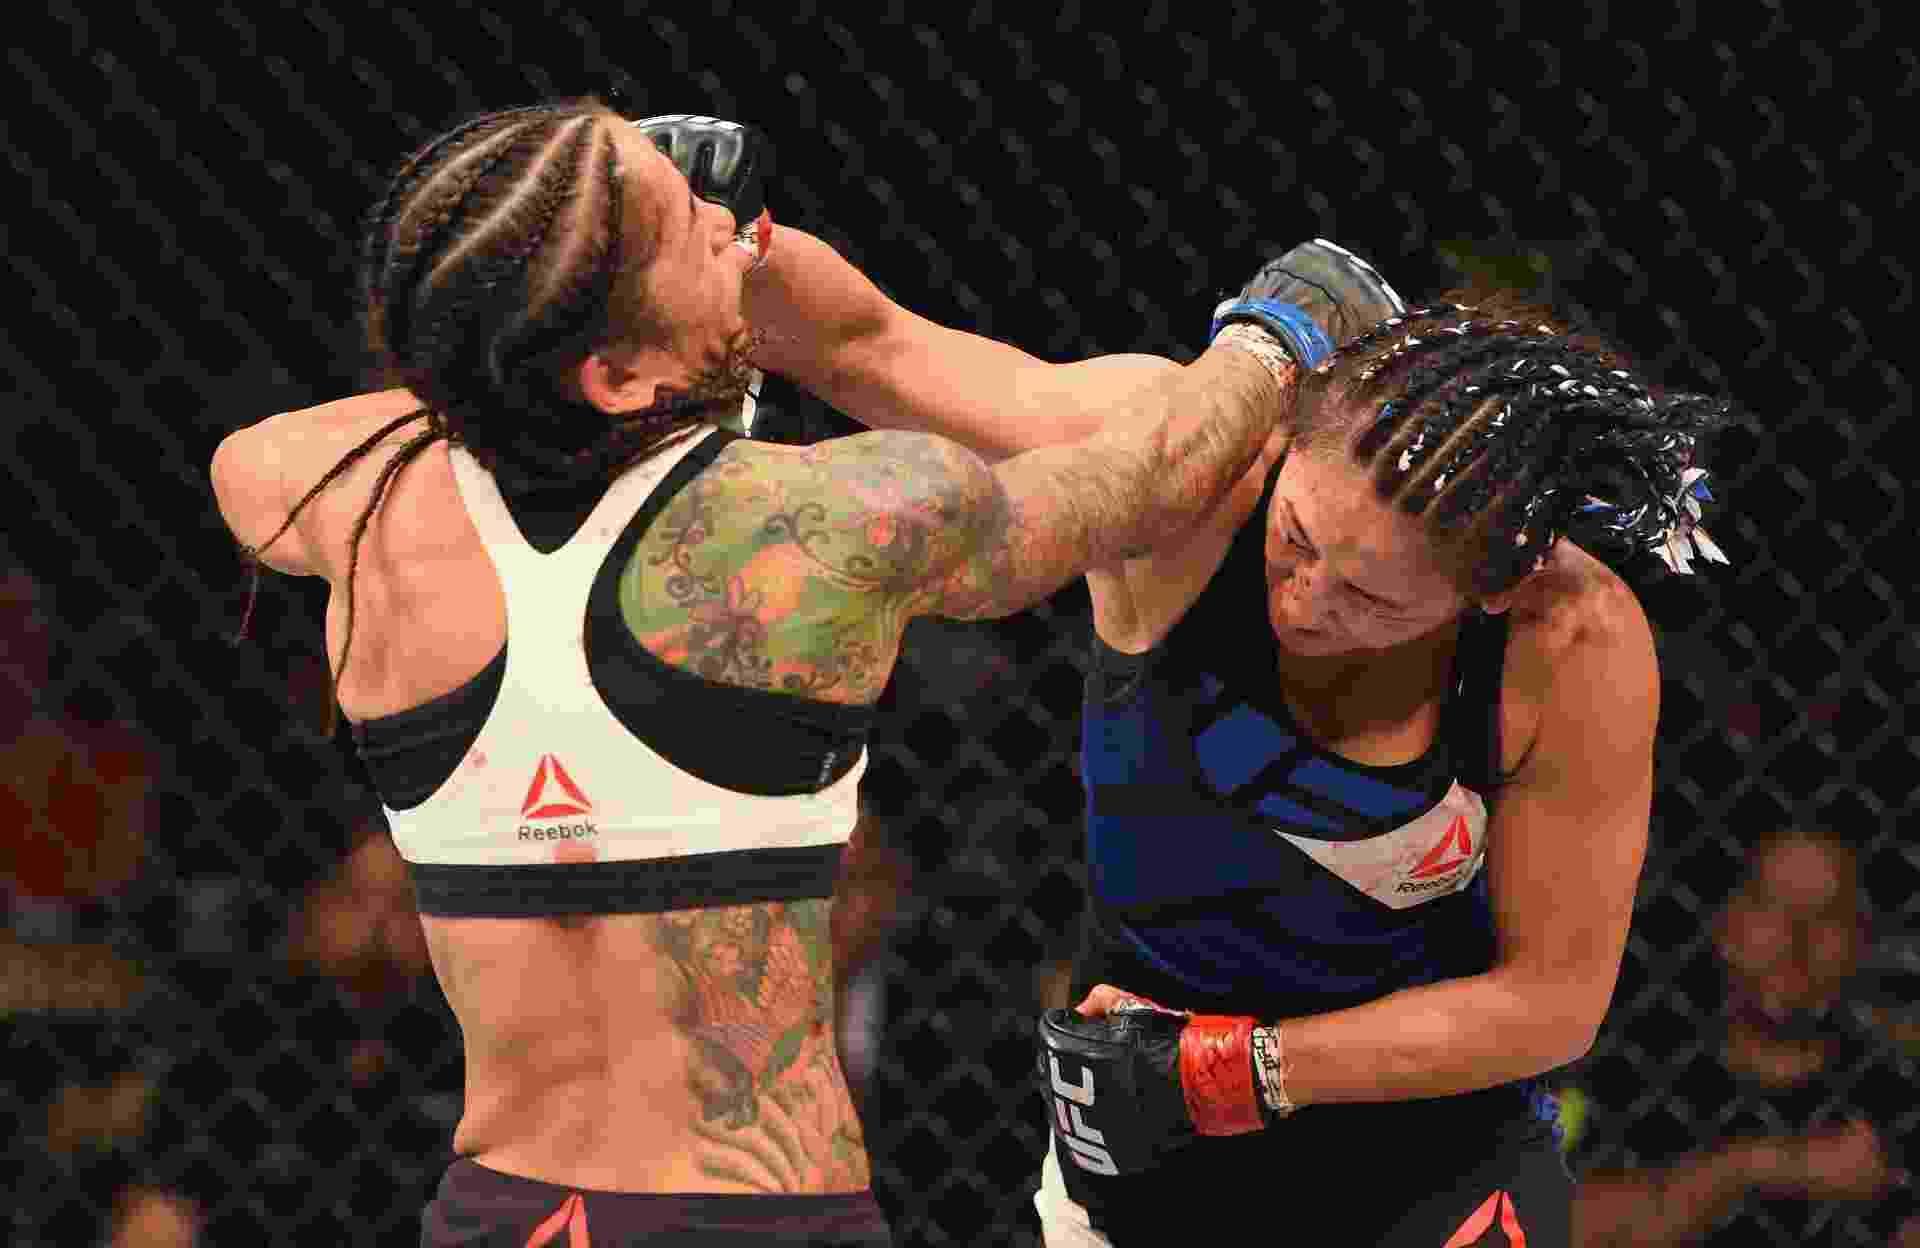 Ex-campeã Carla Esparza acerta soco na brasileira Juliana Lima, durante UFC 197 - Josh Hedges/Zuffa LLC/Zuffa LLC via Getty Images